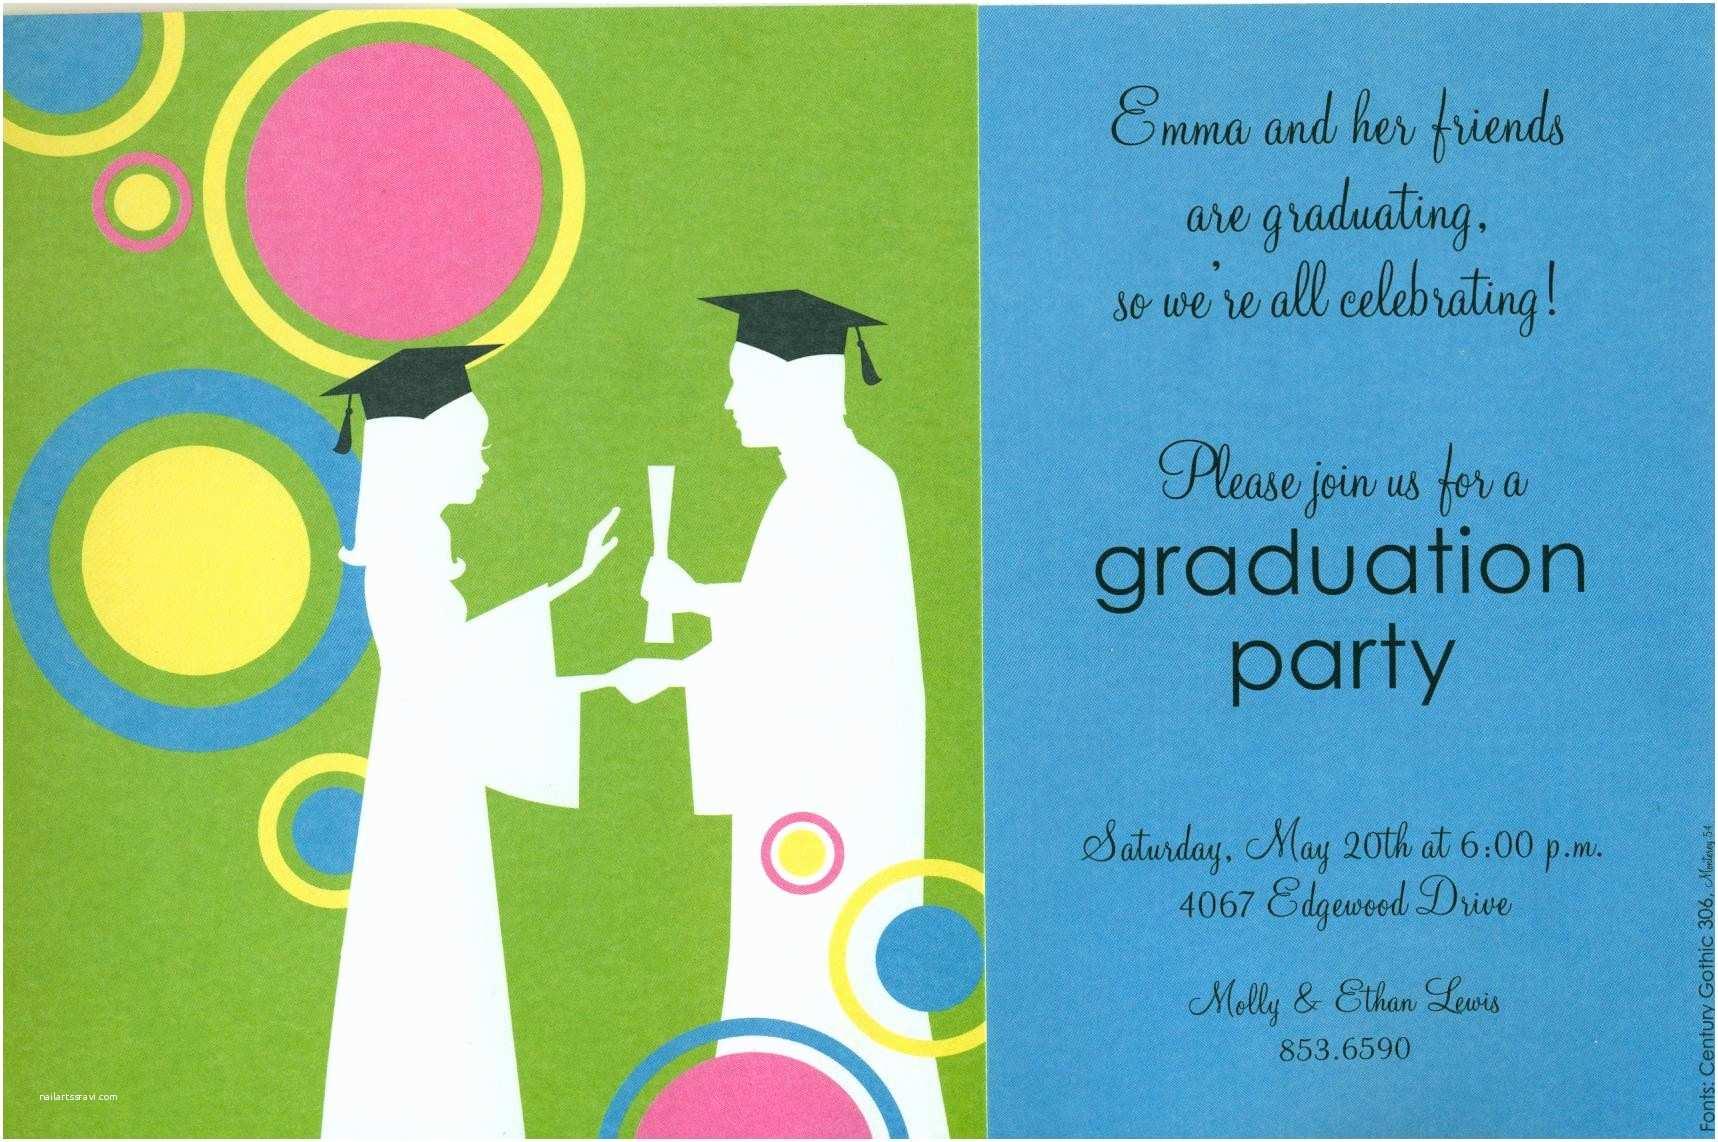 Party Invitation Wording Graduation Party Invitation Wording Templates